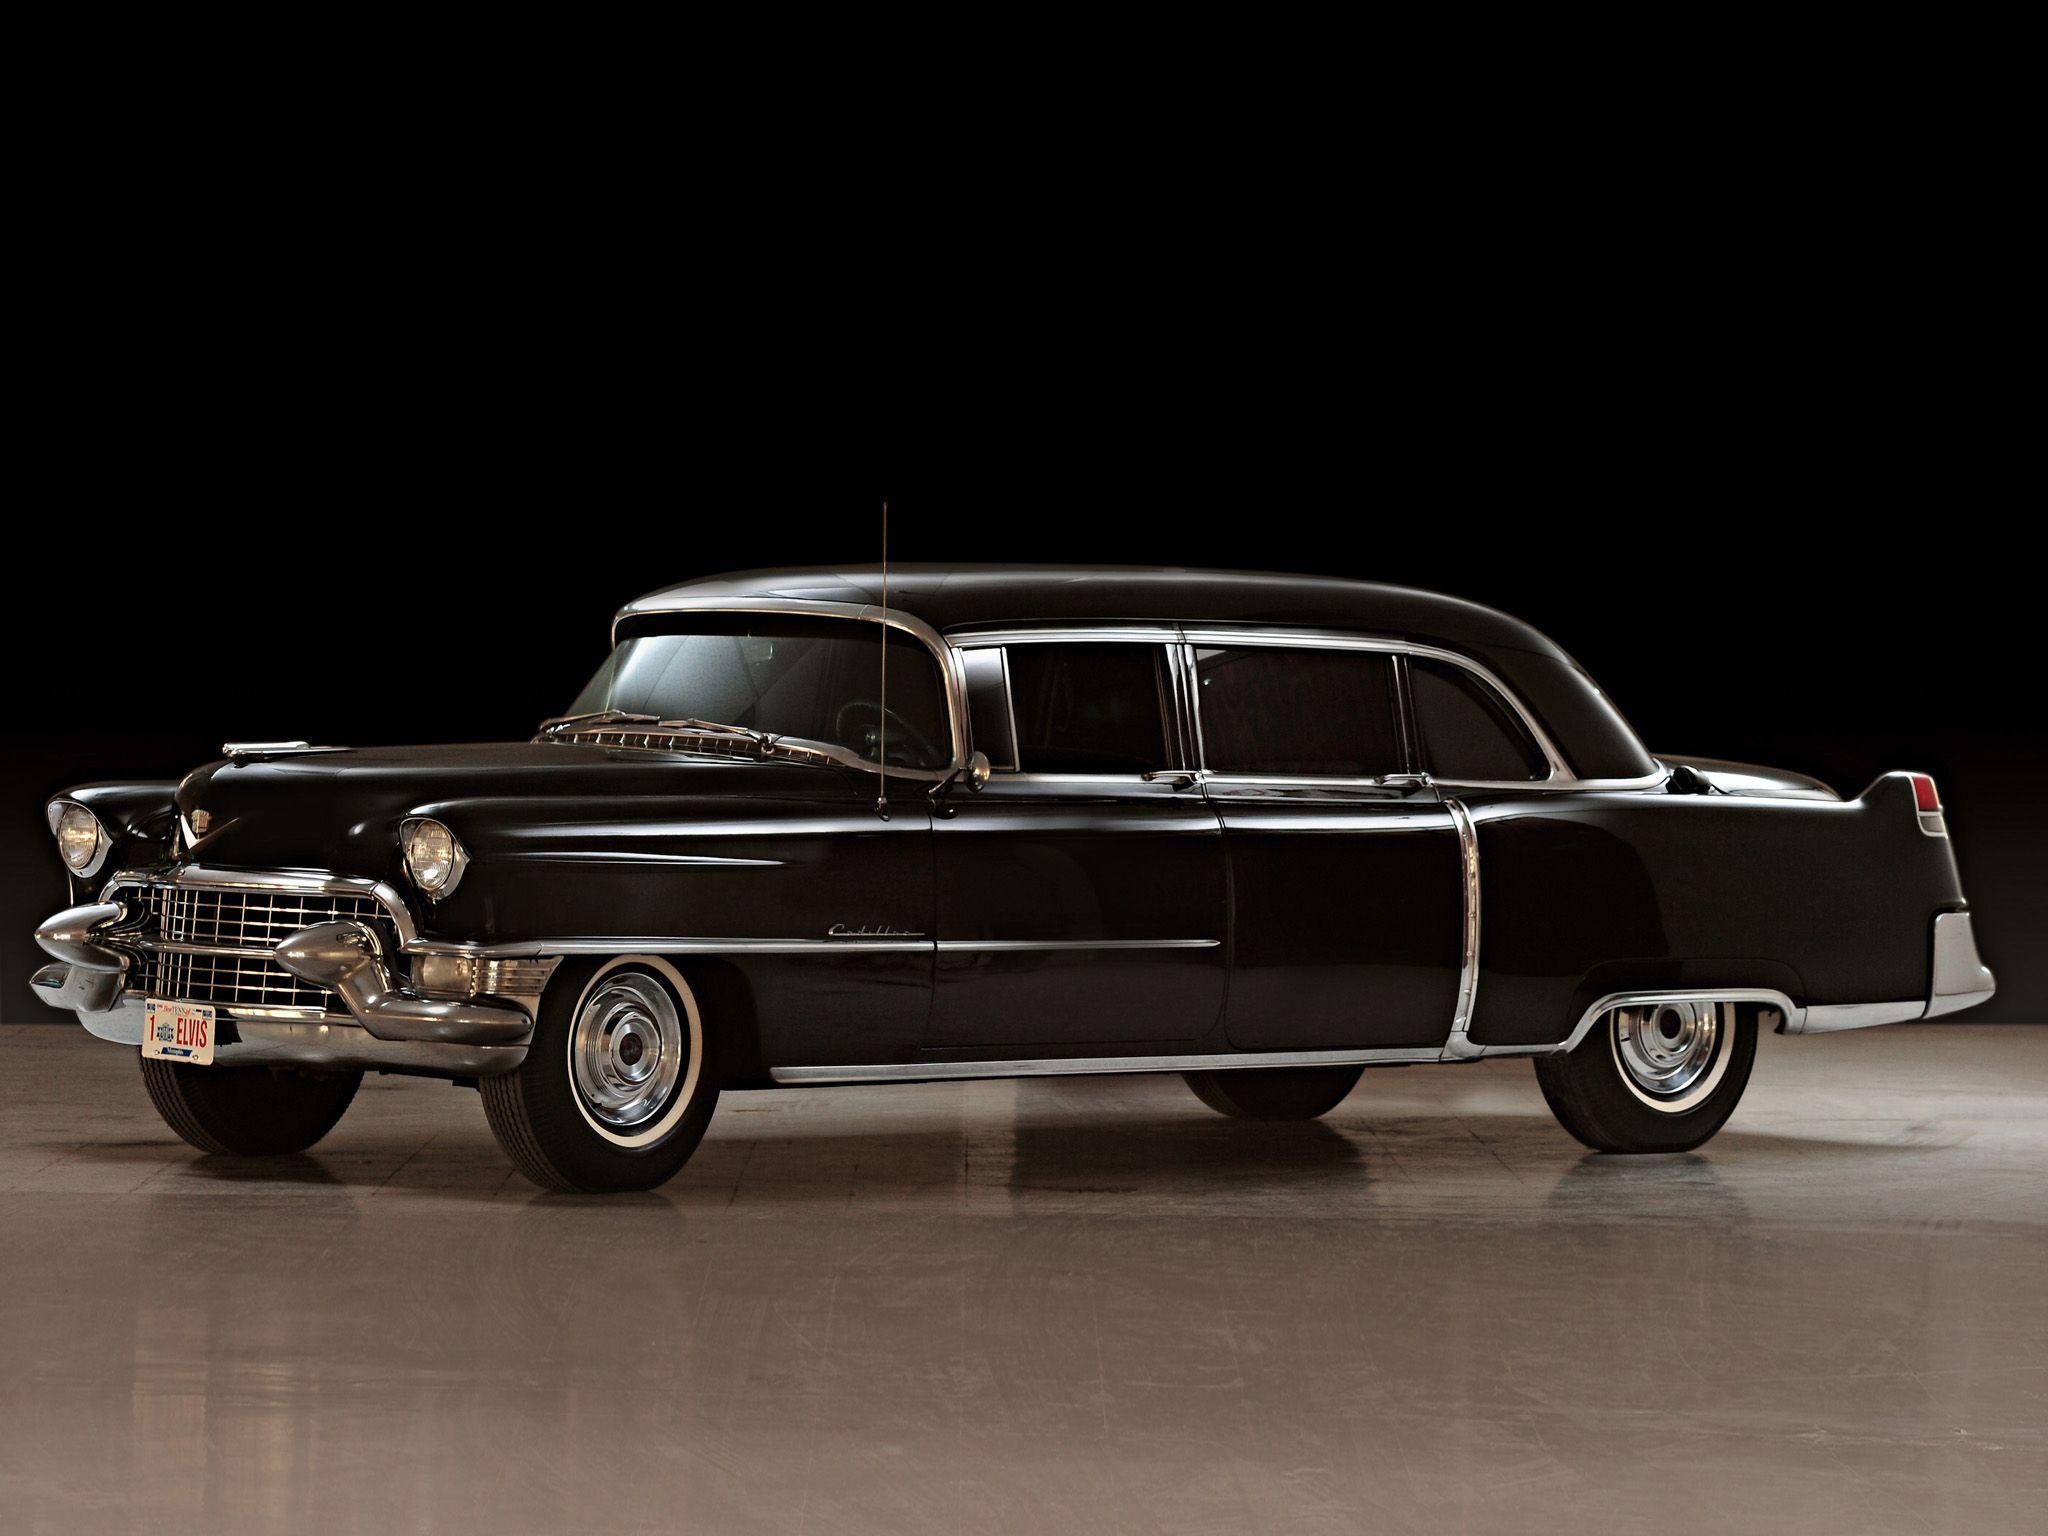 Cadillac fleetwood seventy five limousine 1955